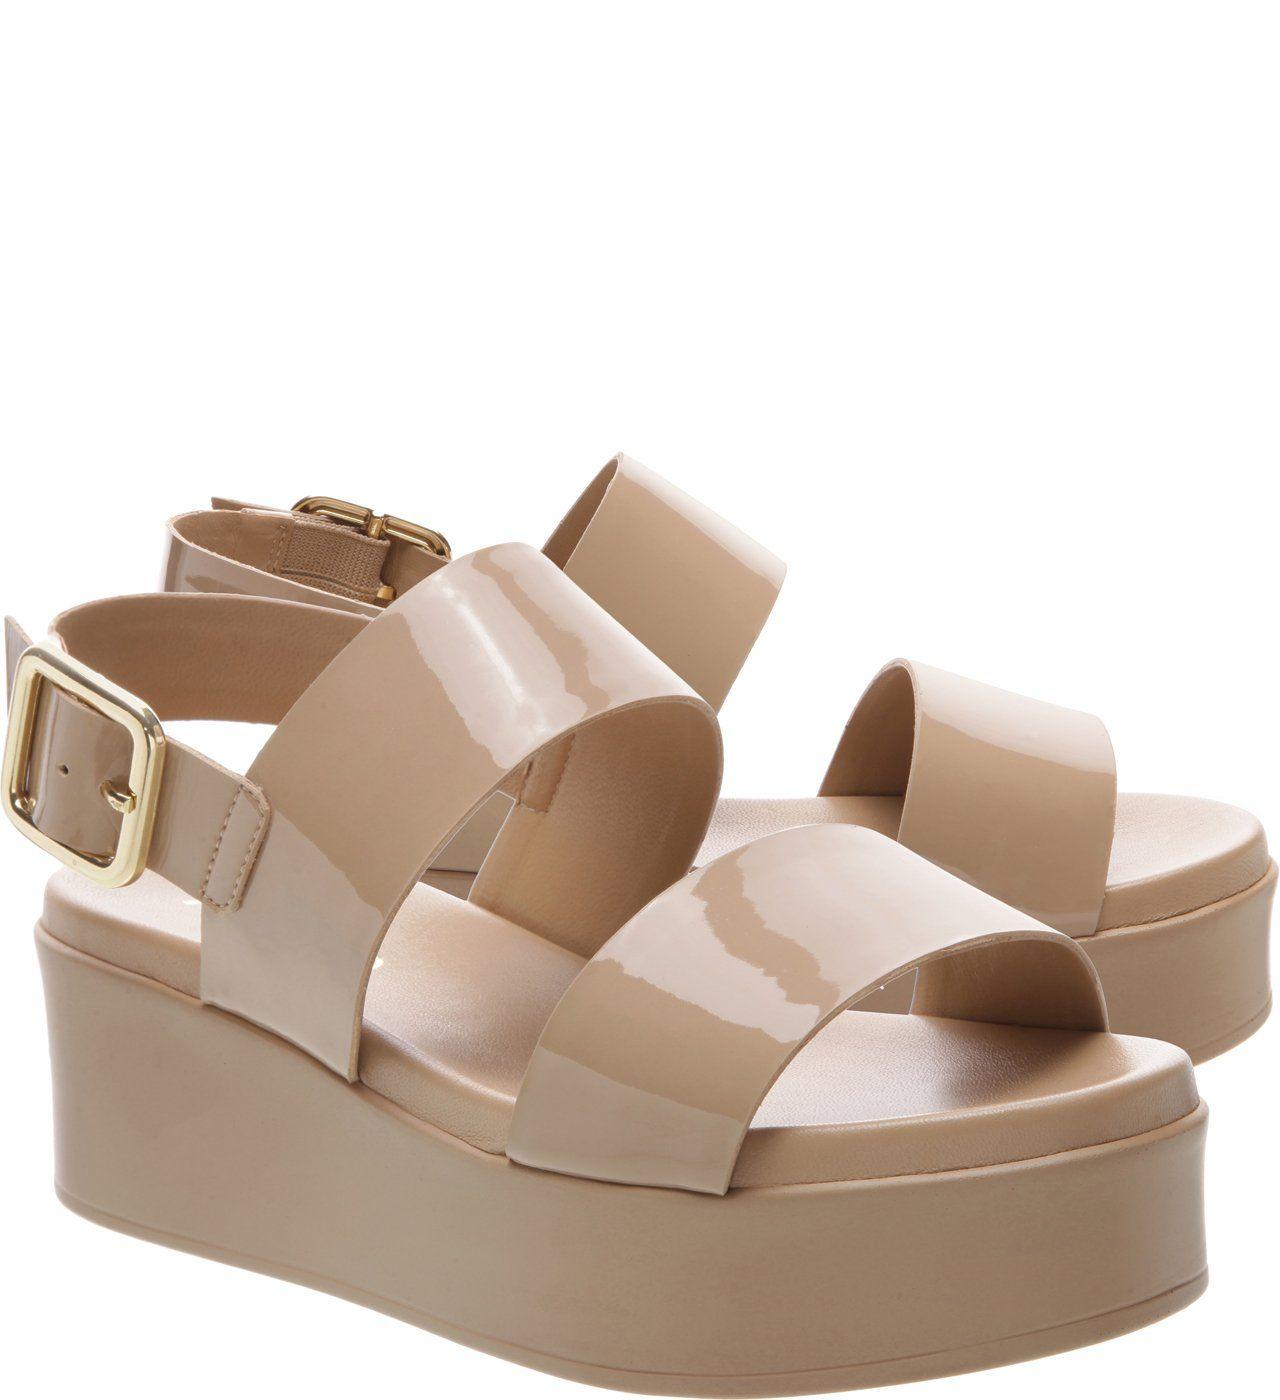 d73cce9a2 Sandália Verniz Plataforma Reto Médio Pale Beige | Arezzo | Shoes em ...